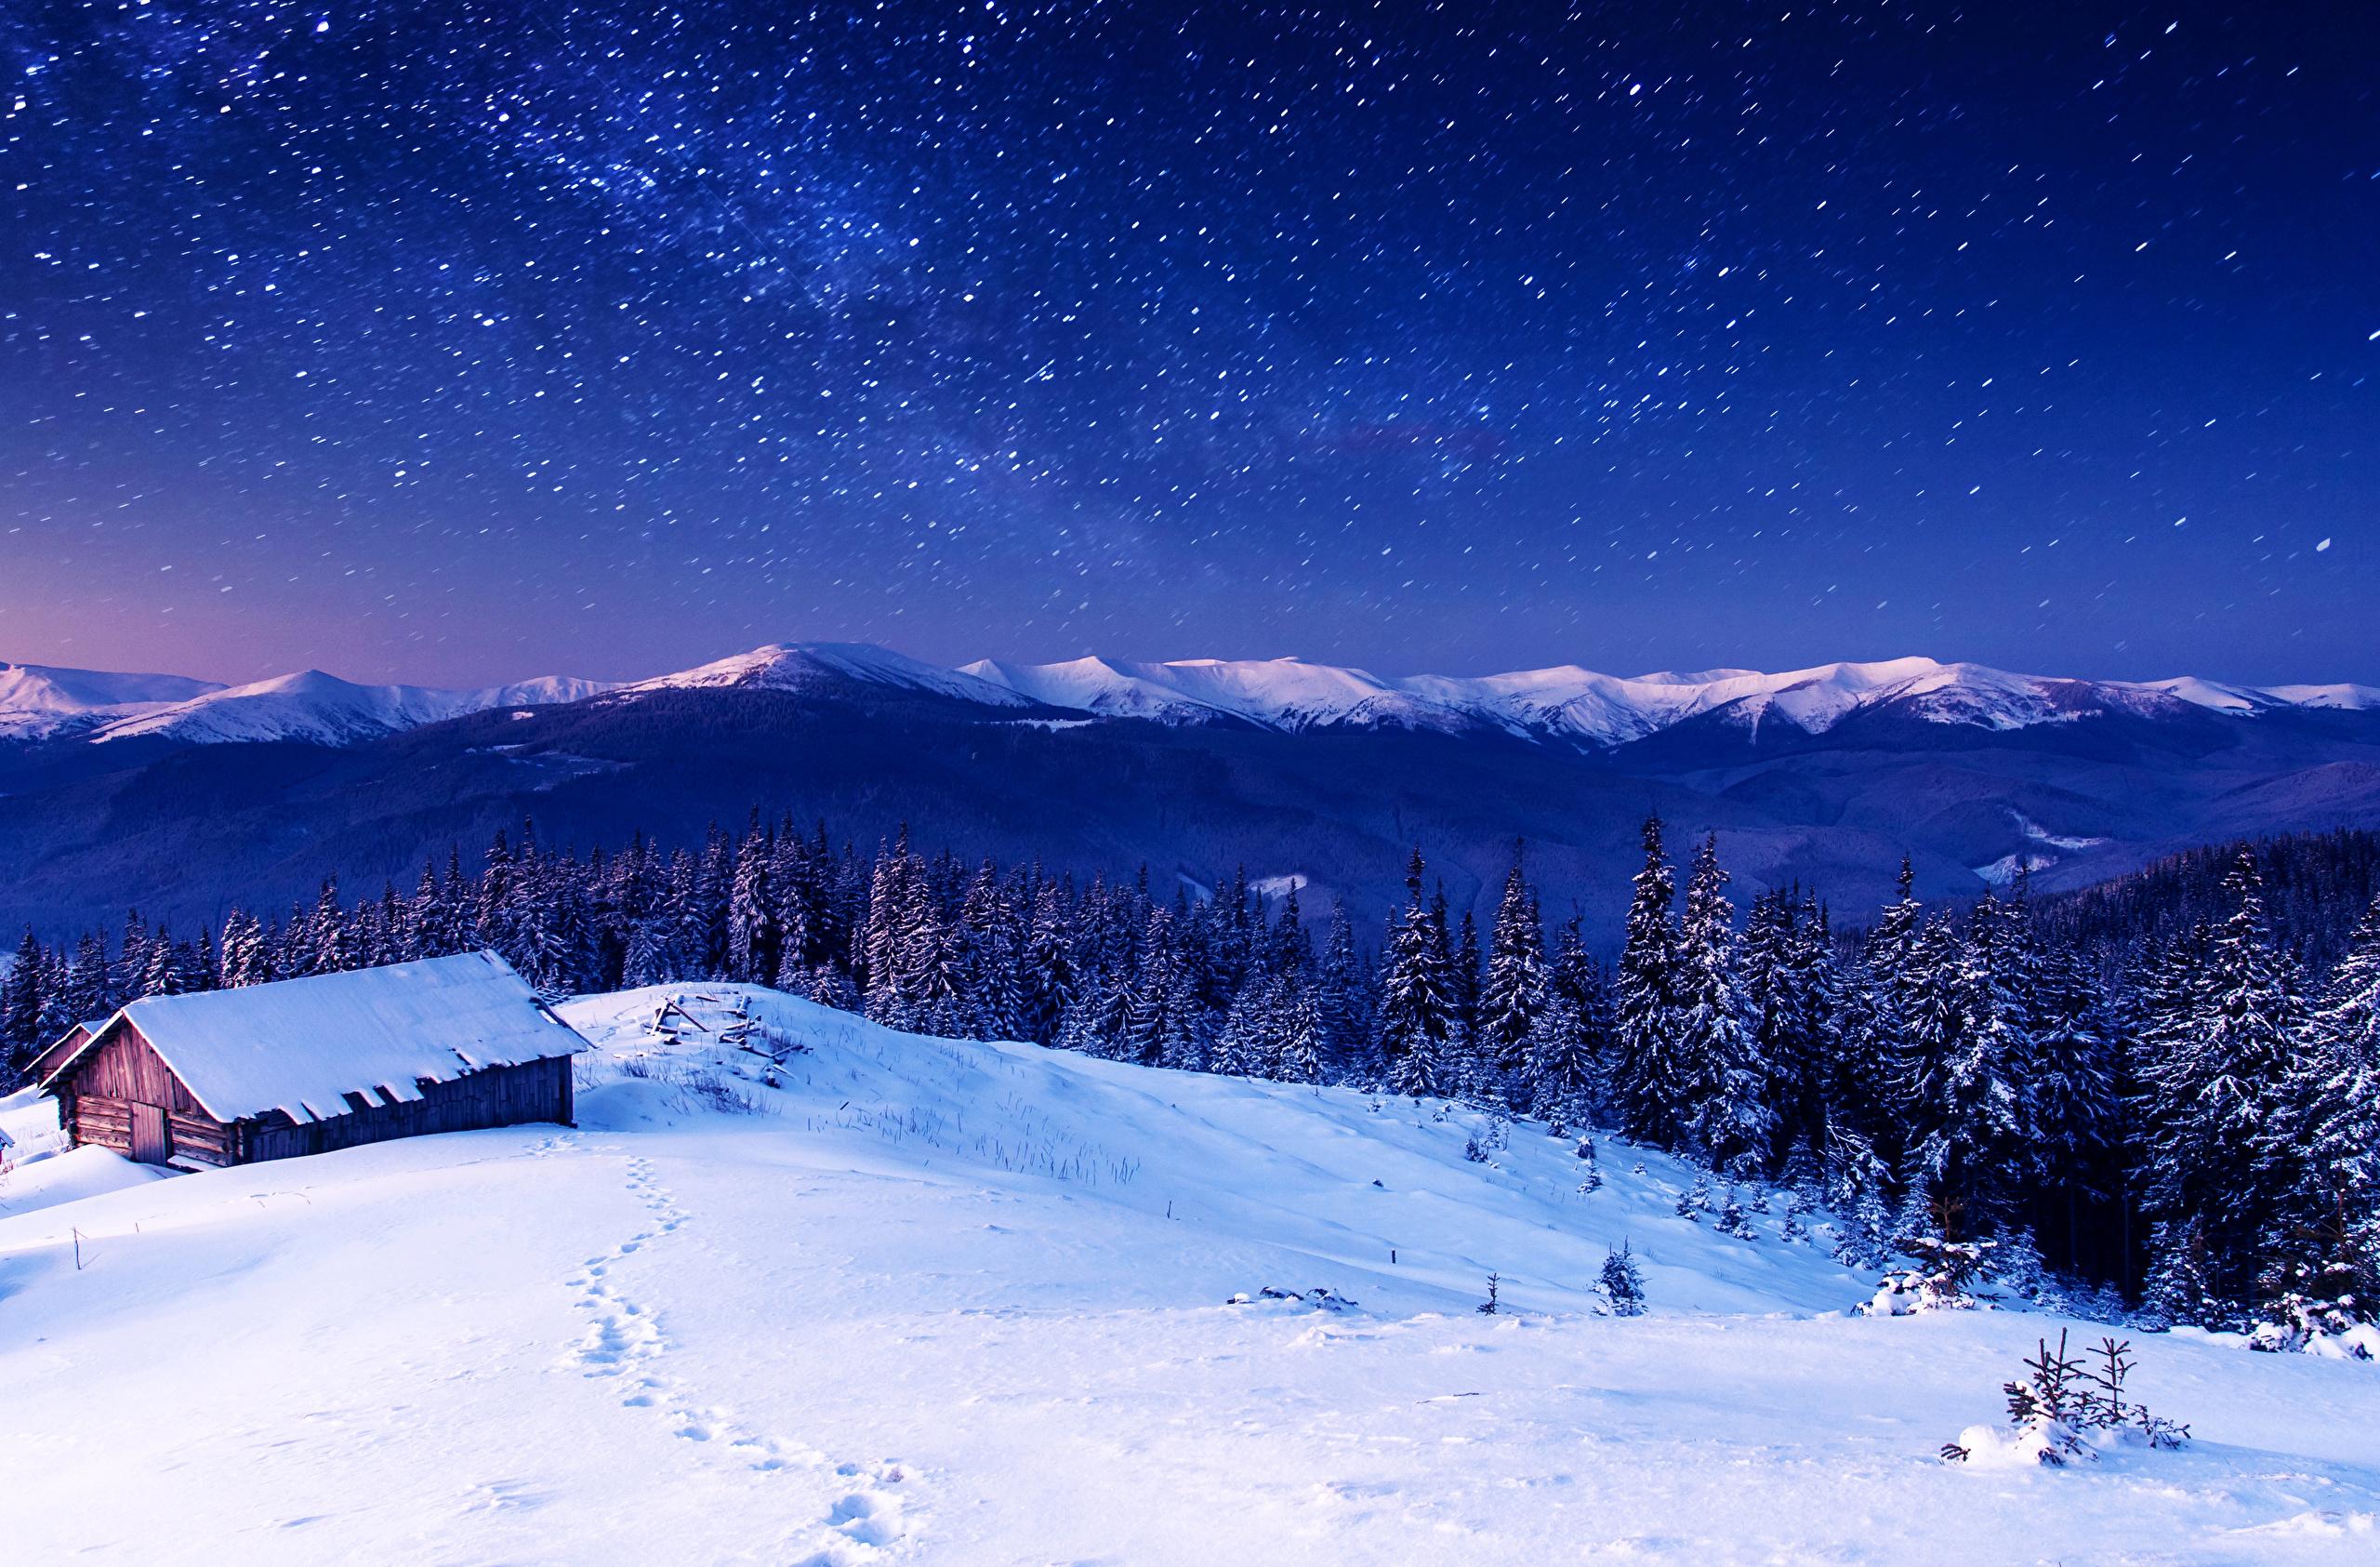 Snowy  Definition of Snowy by MerriamWebster